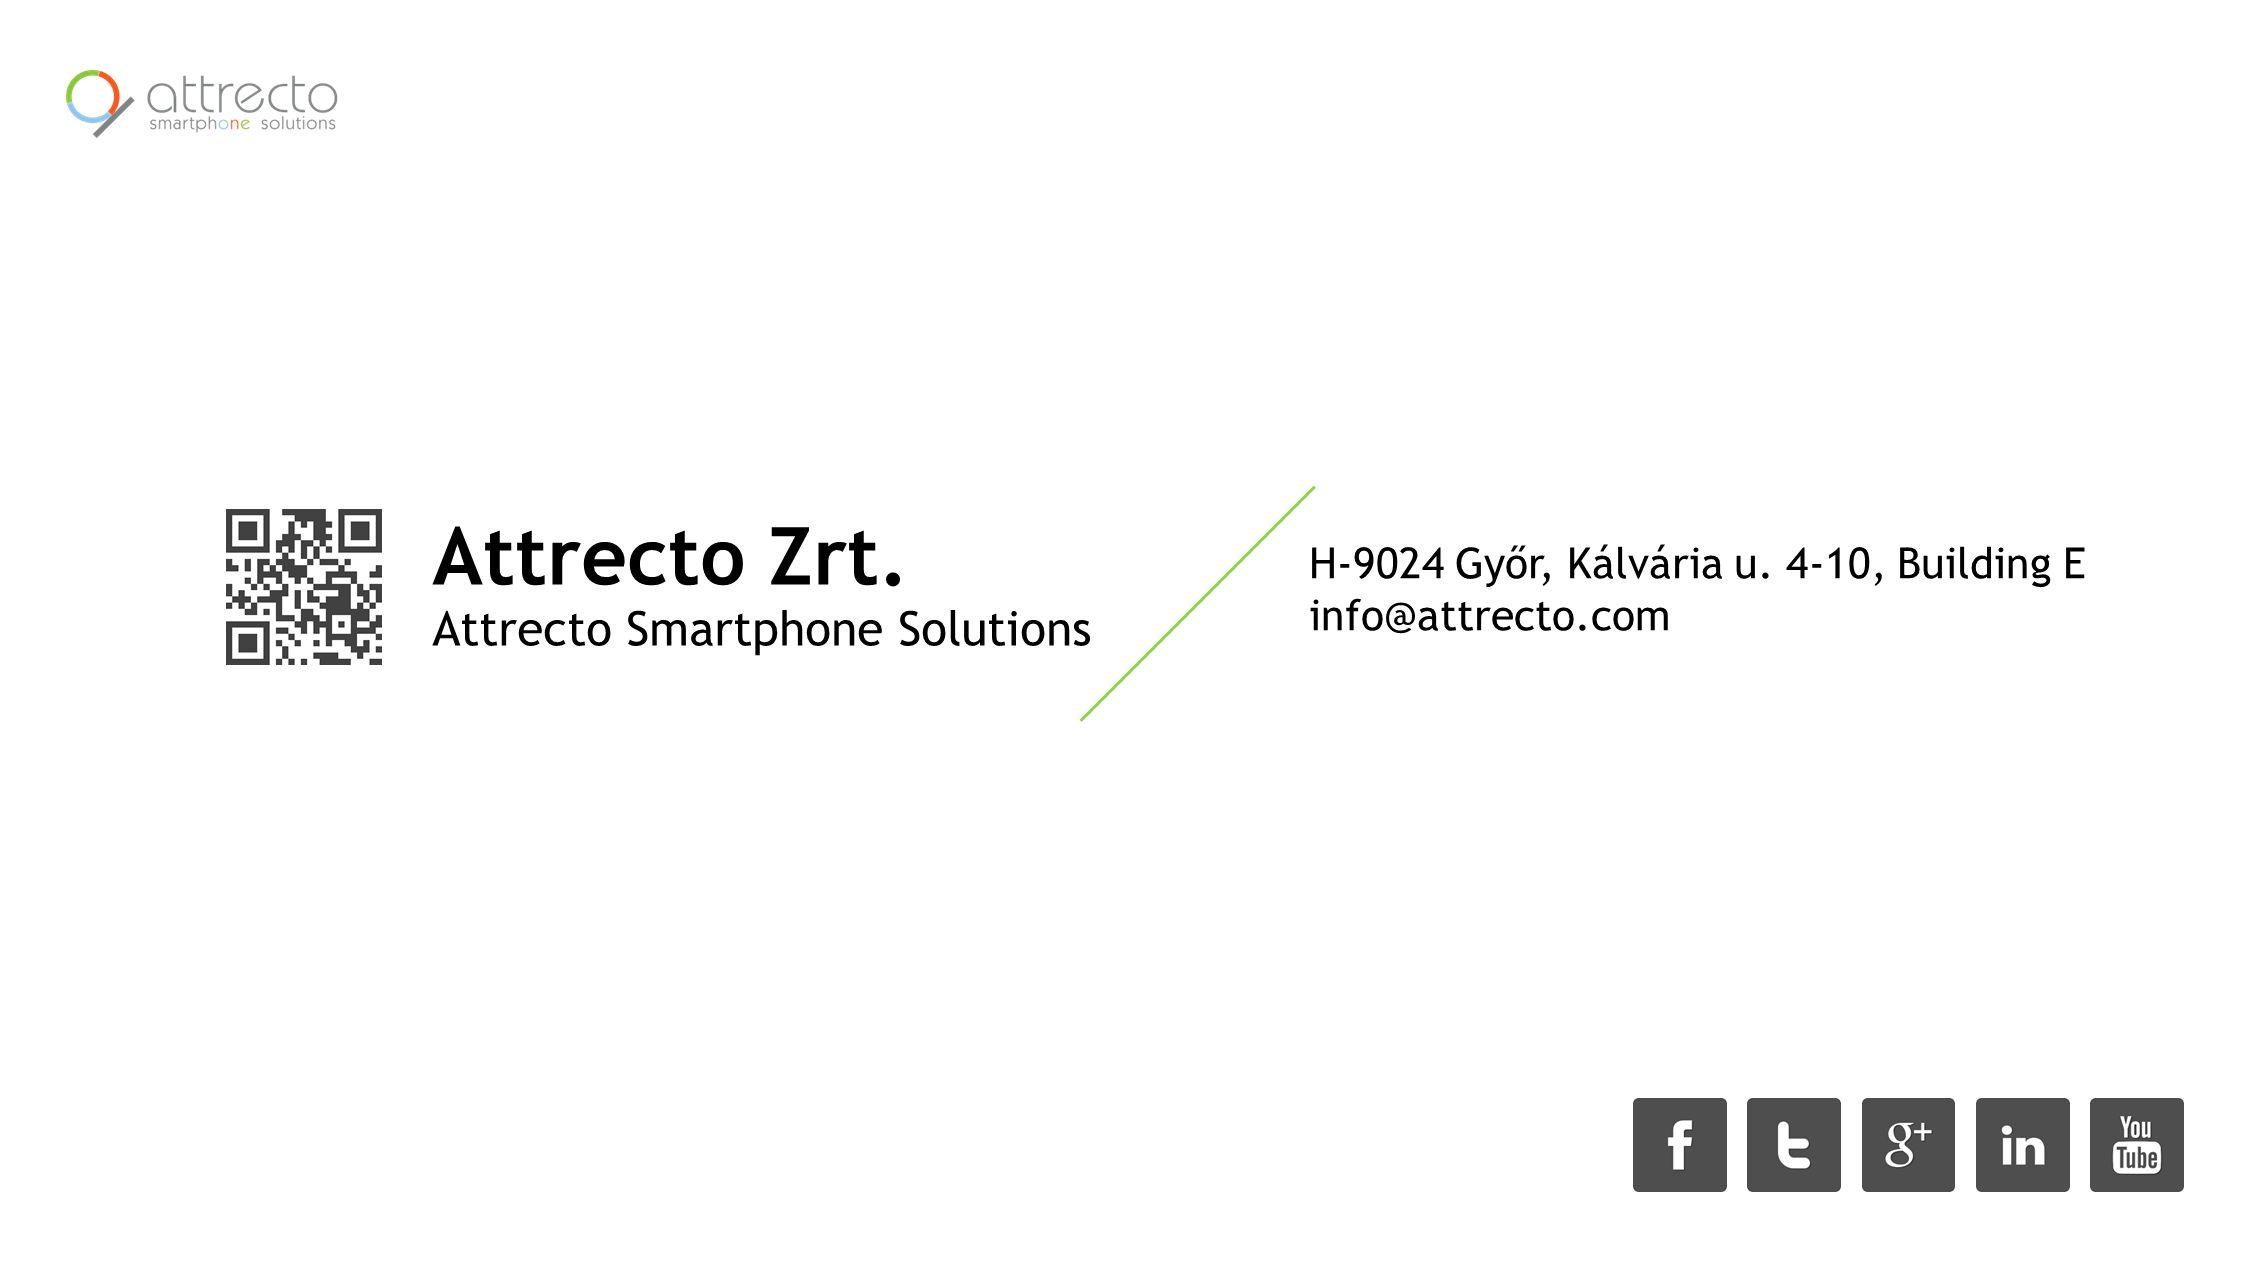 H-9024 Győr, Kálvária u. 4-10, Building E info@attrecto.com Attrecto Zrt.